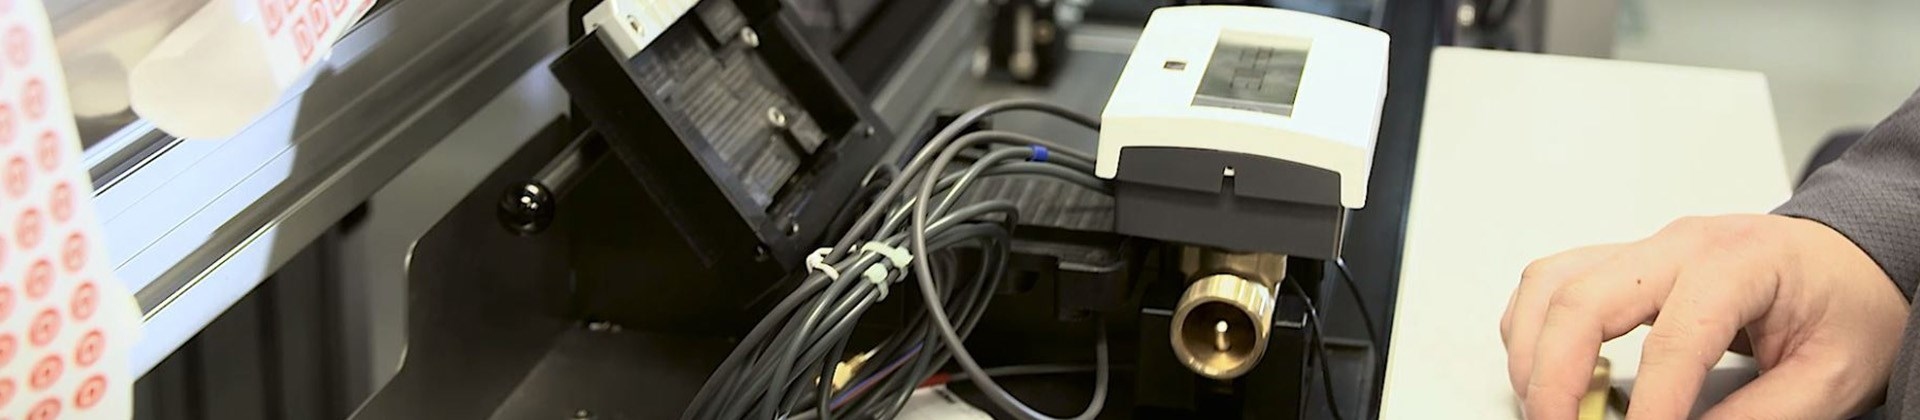 SonoSelect 10 heat/cool meter | Danfoss